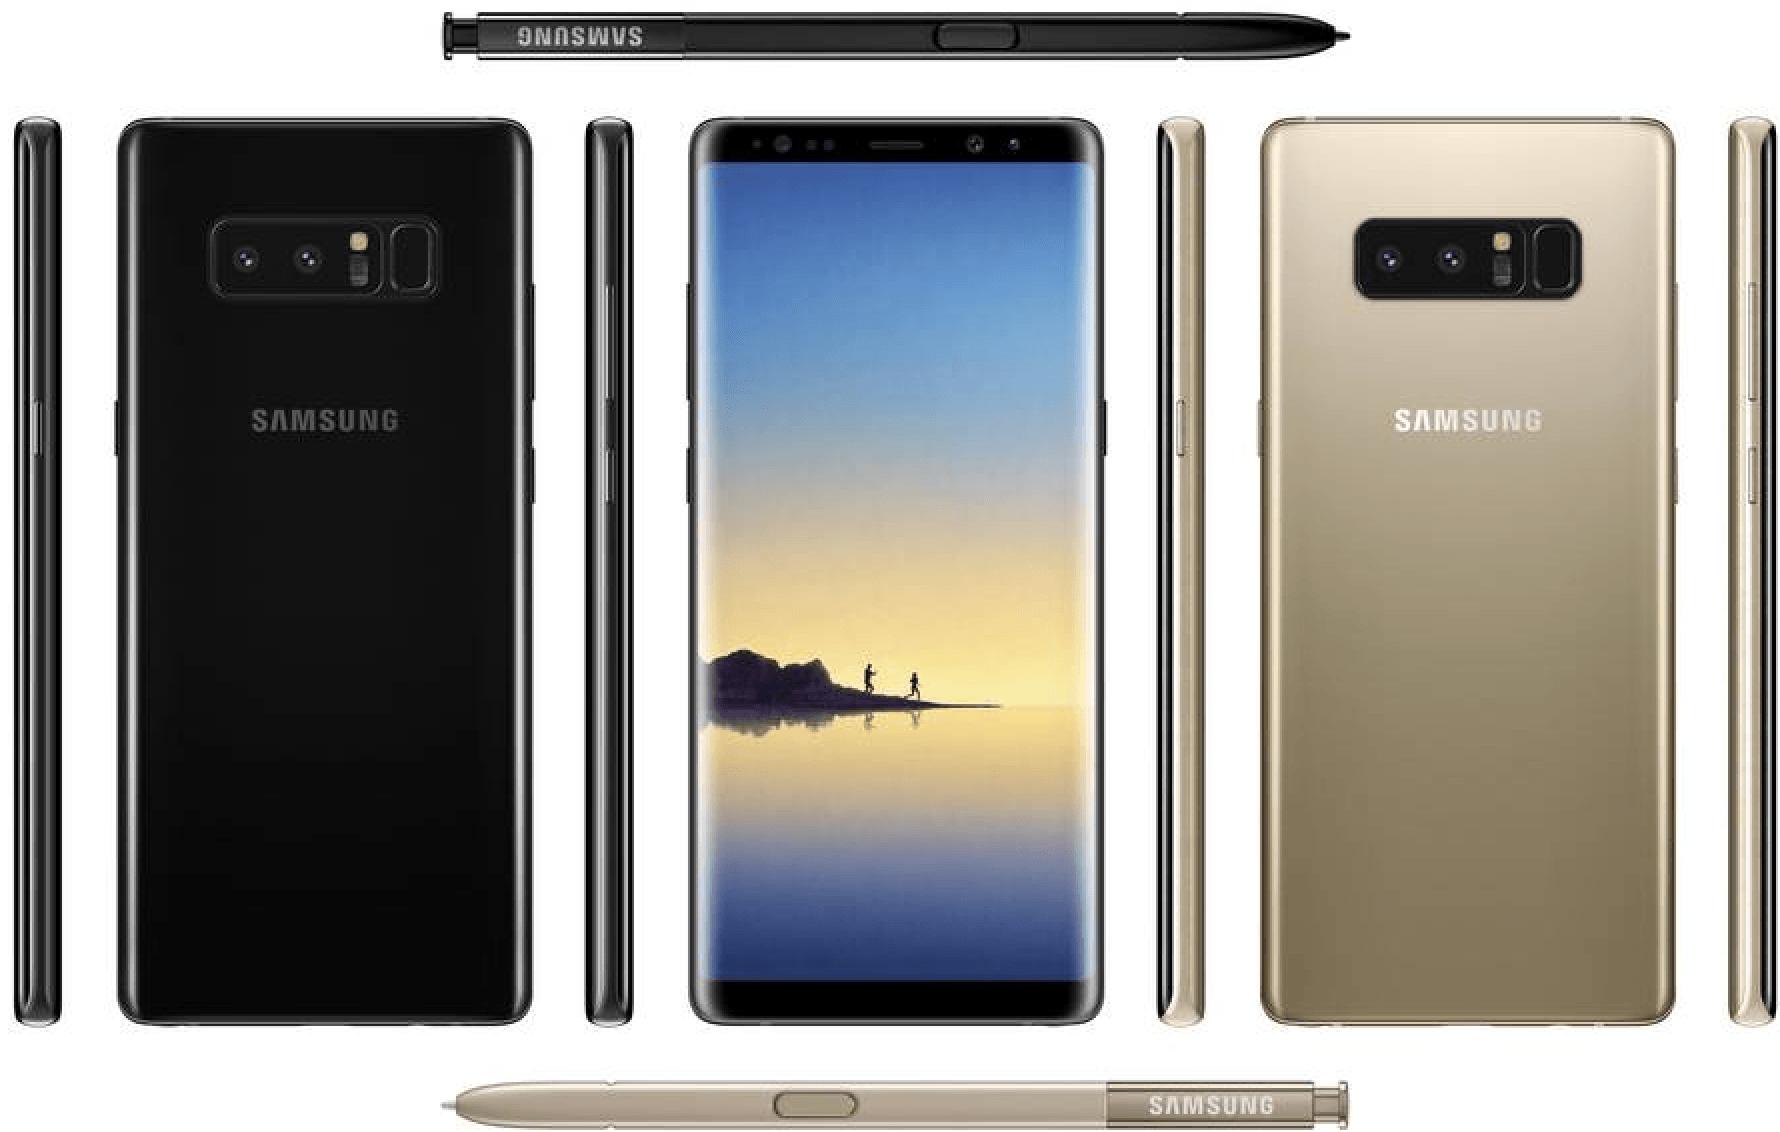 b8d130f7 Samsung Galaxy Note 8 test – Note er stadig total unik